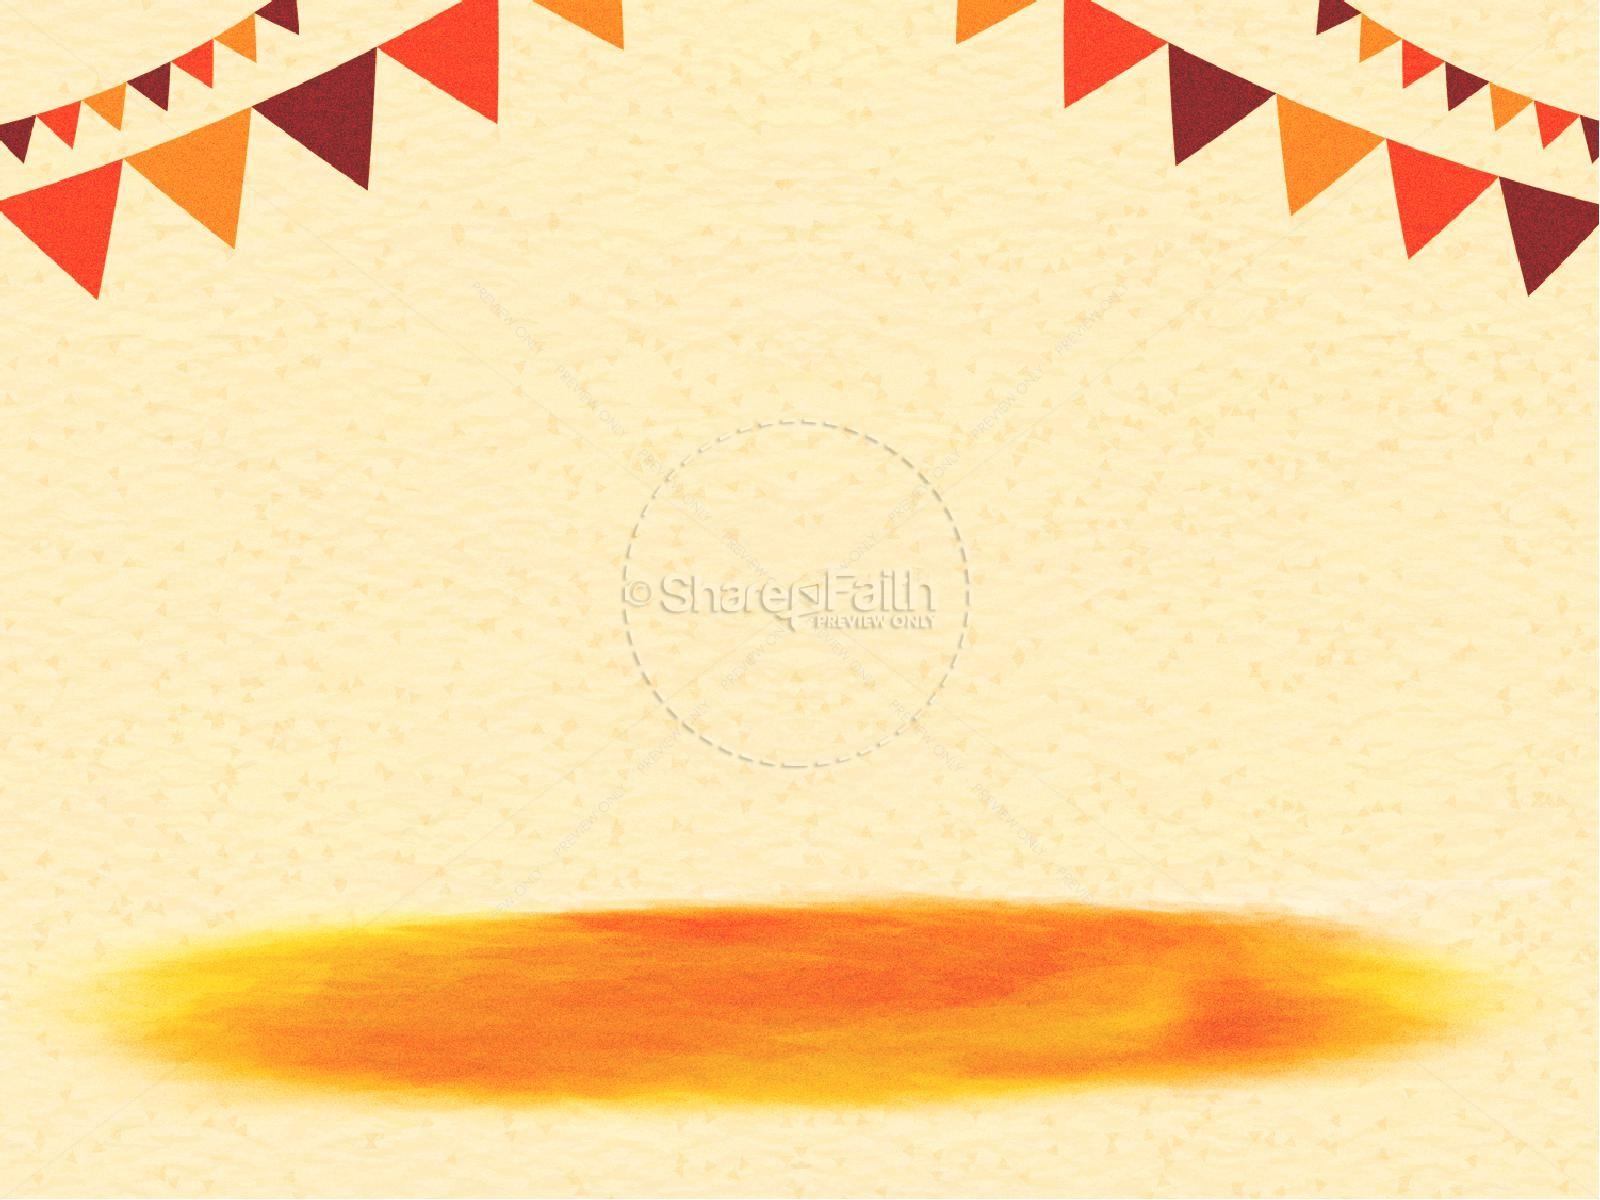 Harvest Party Pumpkin Graphic | slide 6